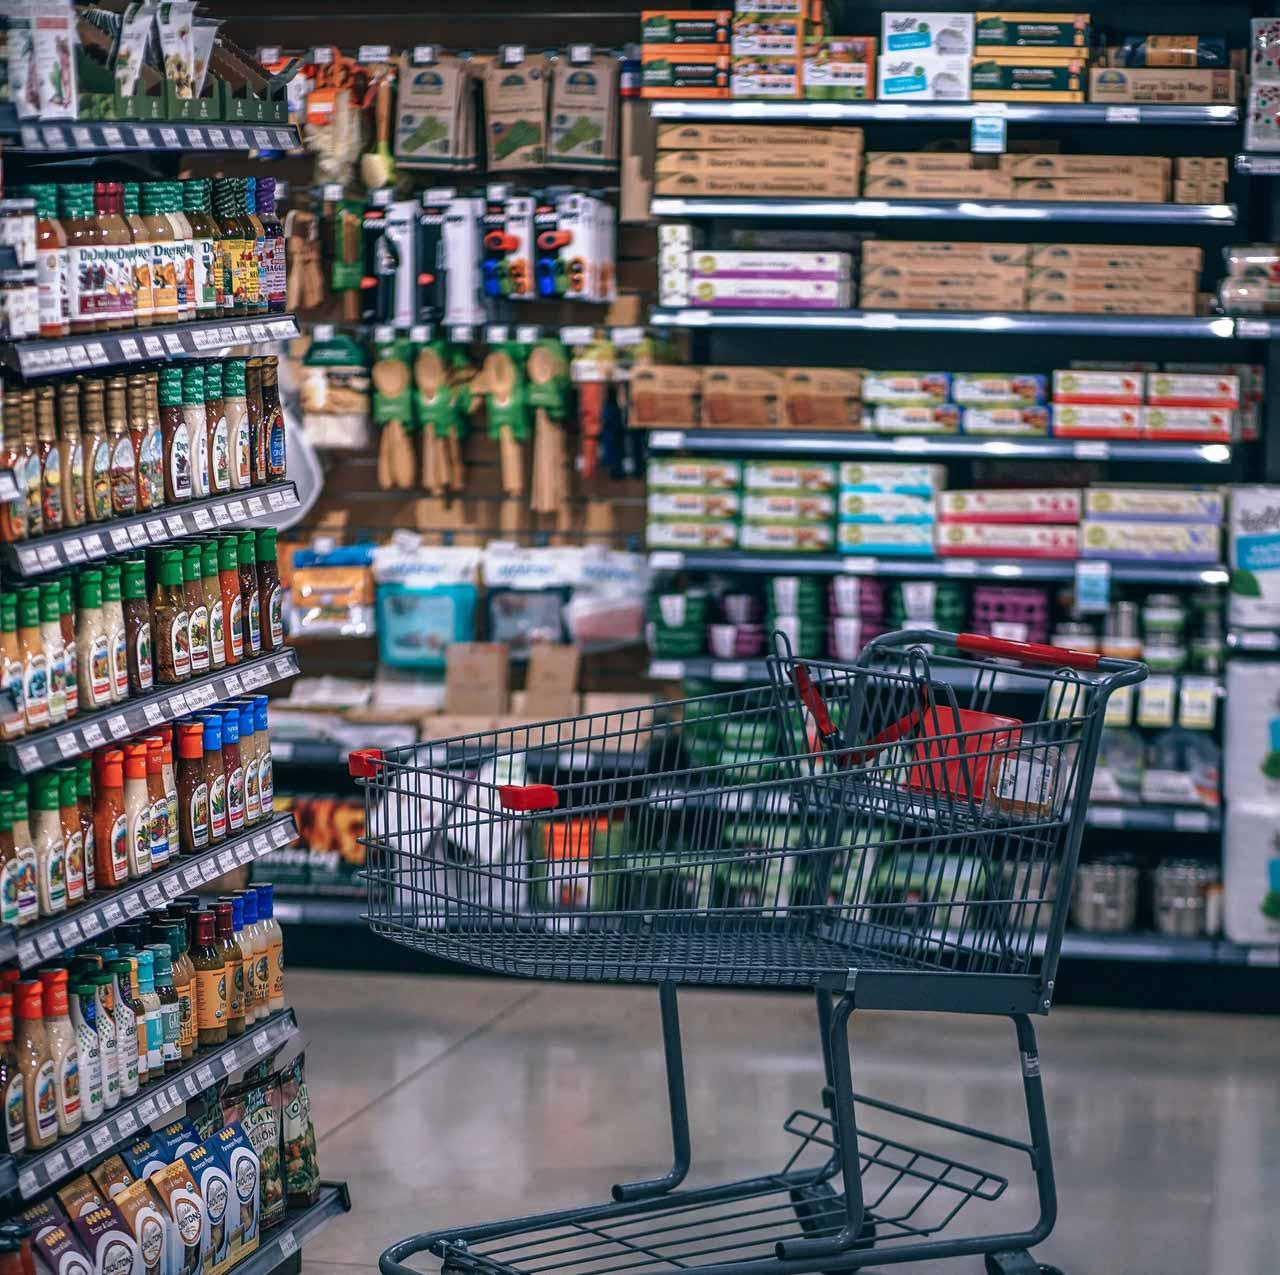 aisle-buy-cart-811105